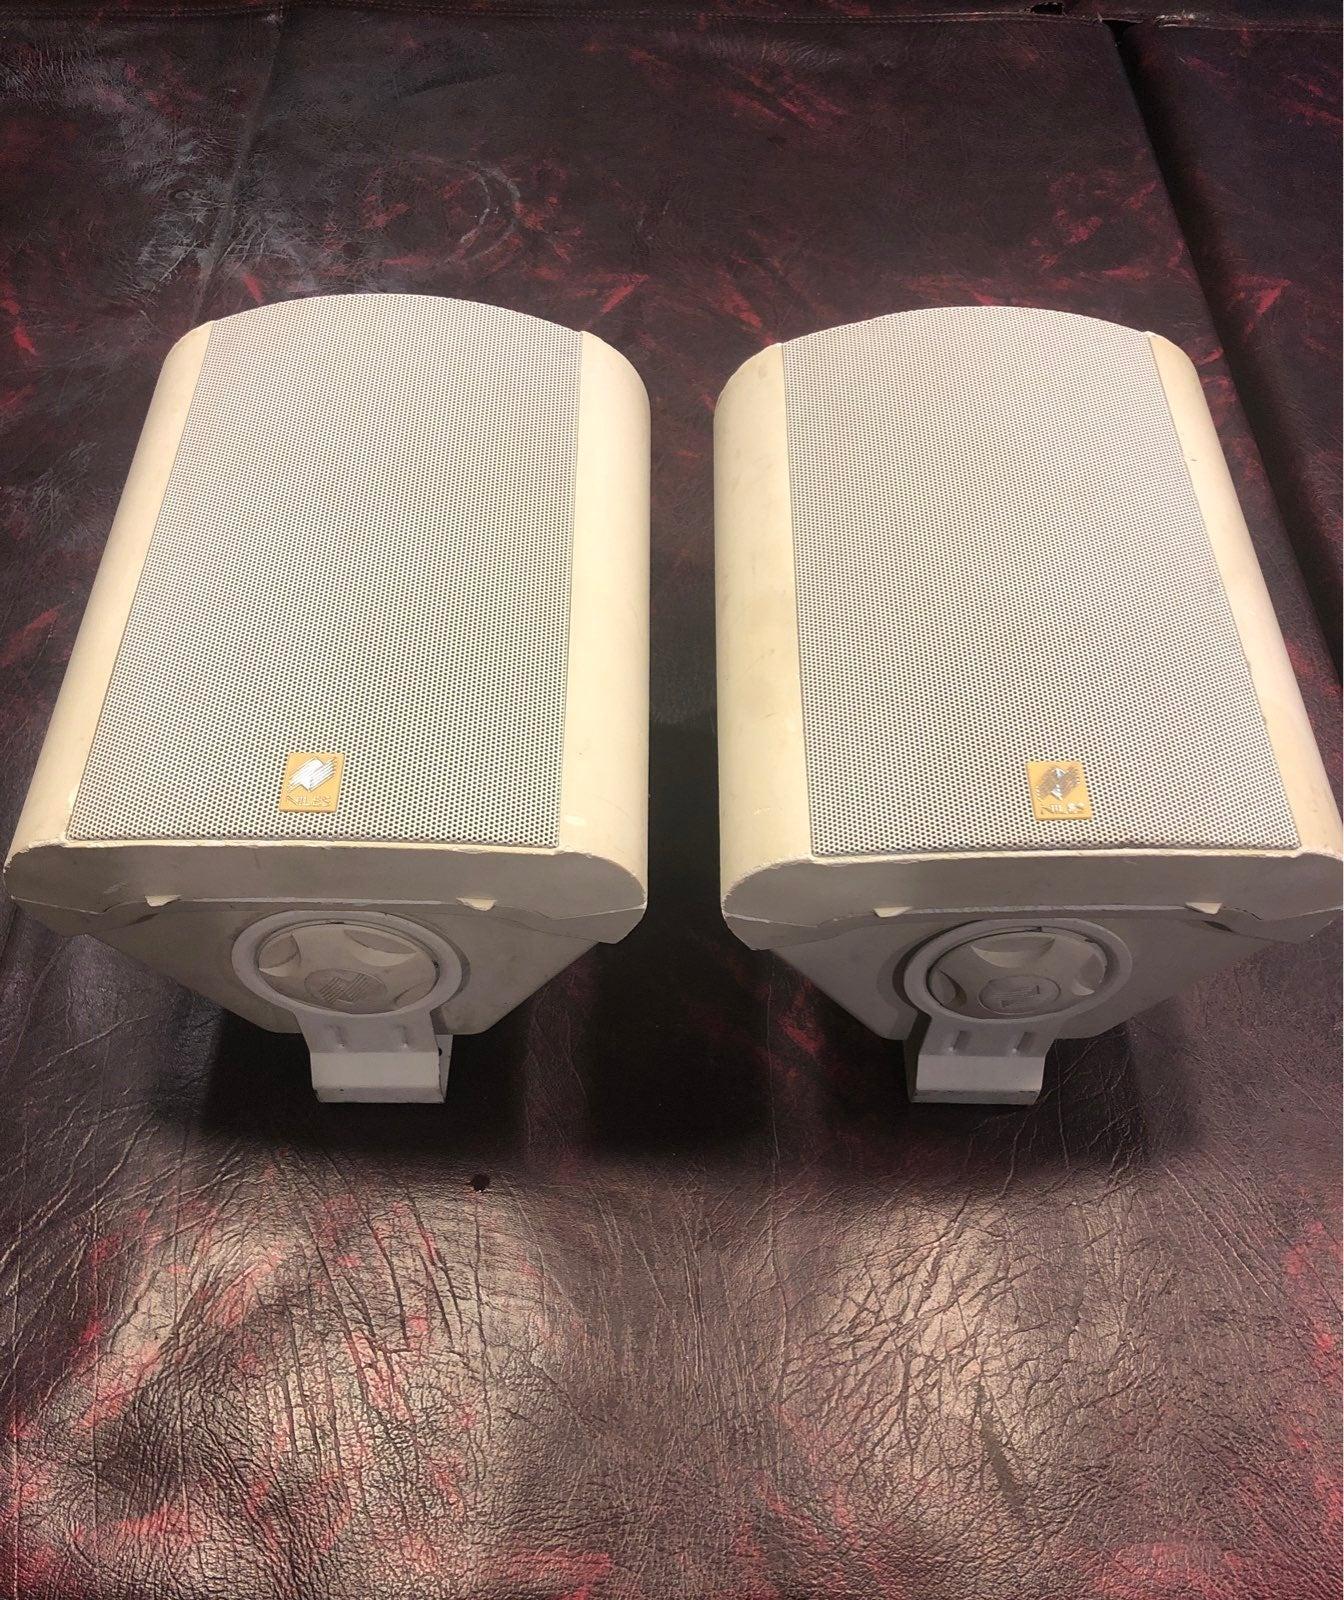 Niles OS-10 Indoor outdoor speakers Whit